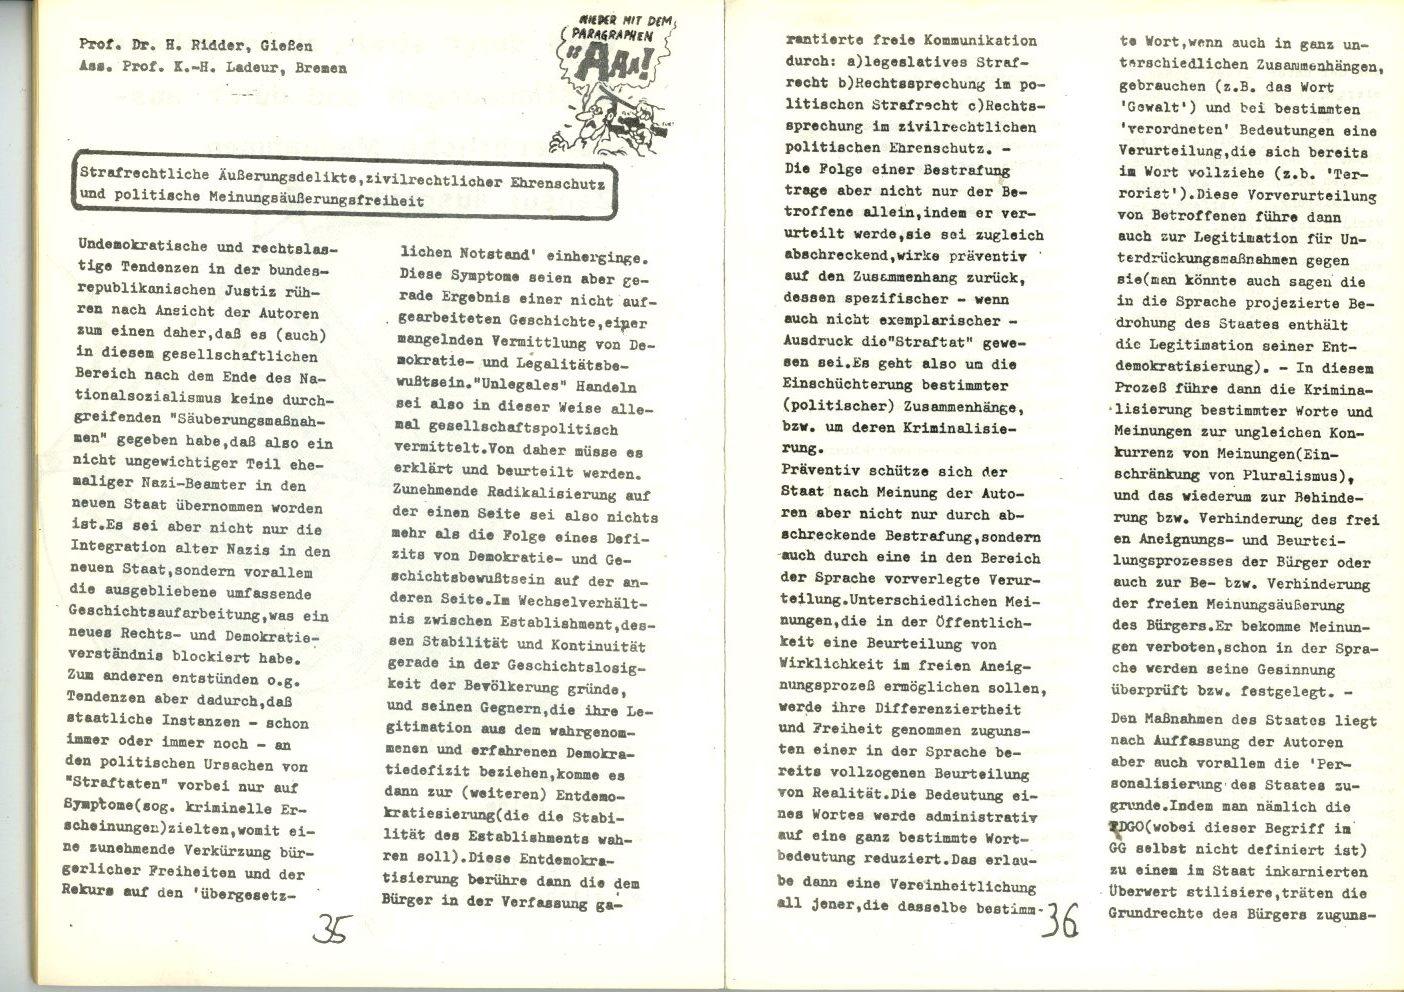 Marburg_Russell_Initiative_1978_19